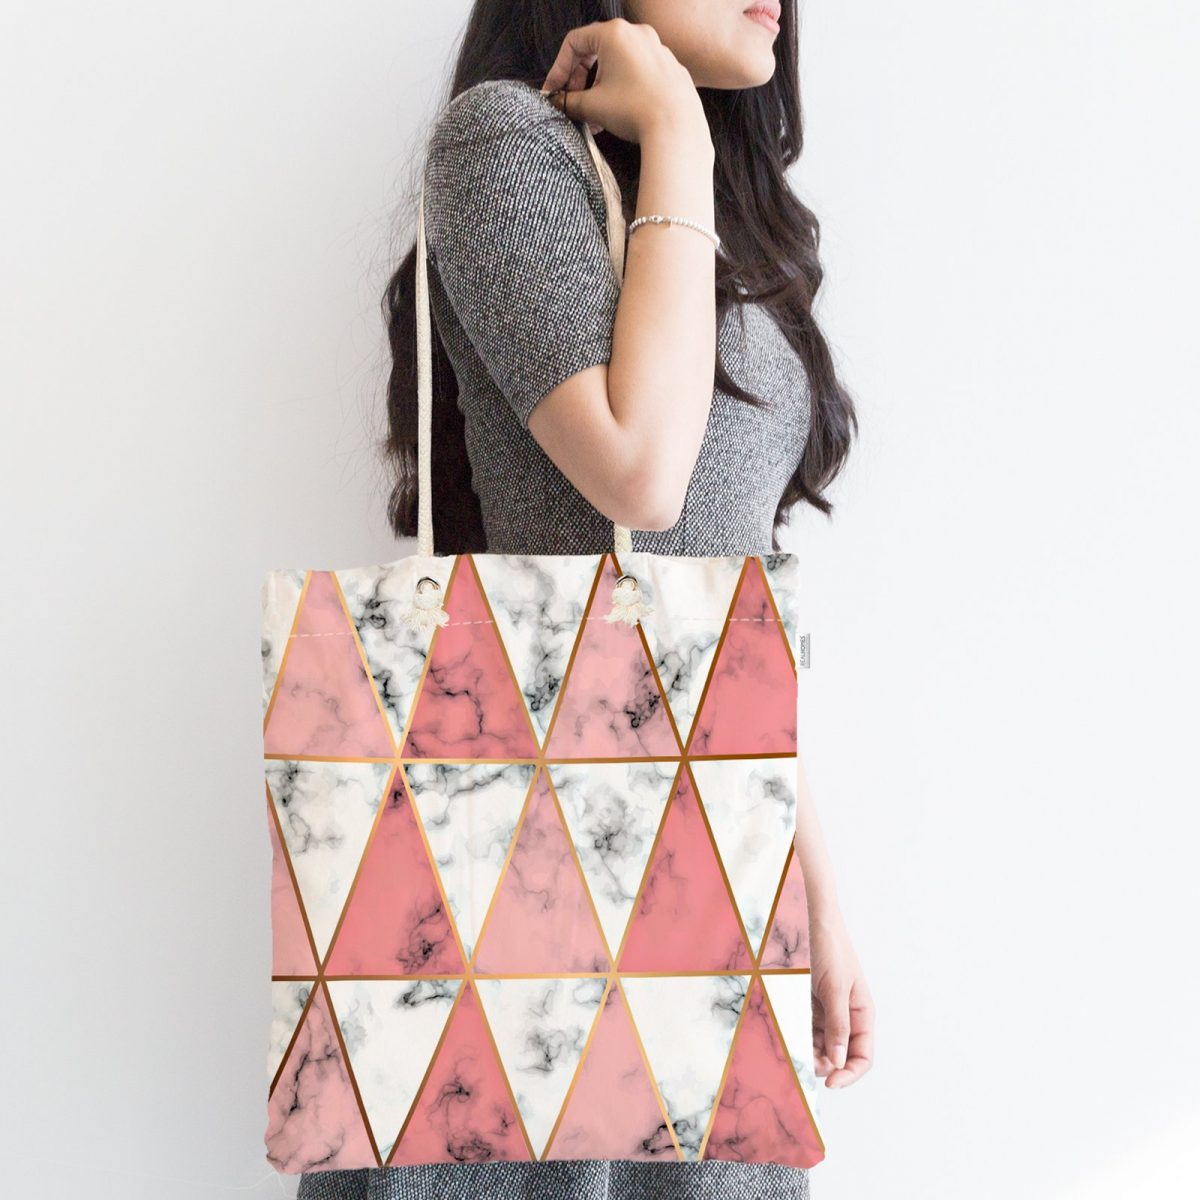 Geometrik Üçgen Şekilli Mermer Desenli Fermuarlı Kumaş Çanta Realhomes